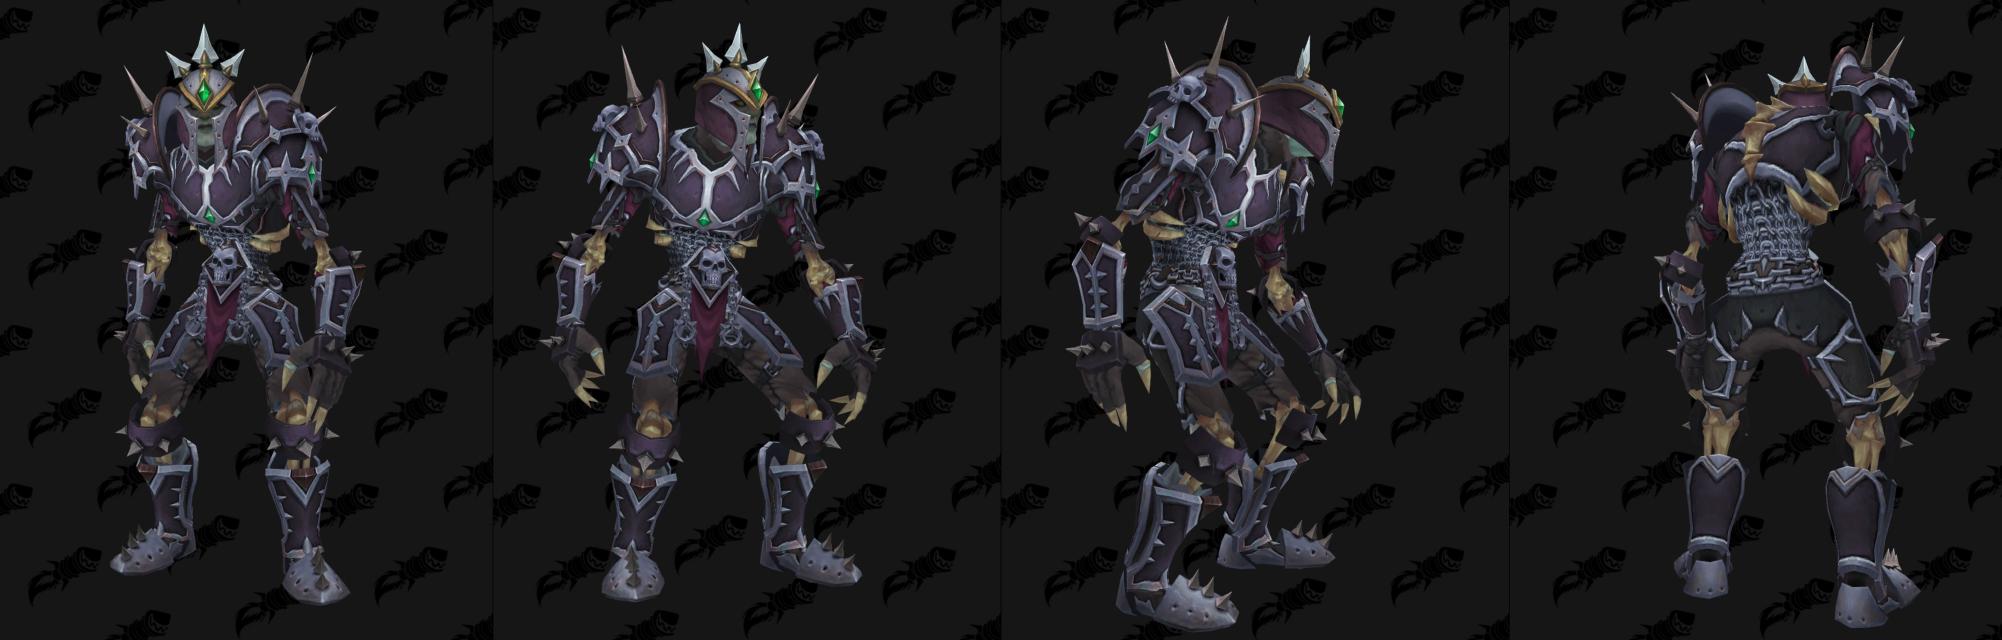 Armure Plaques Horde - Front de guerre Sombrivage Tier 2